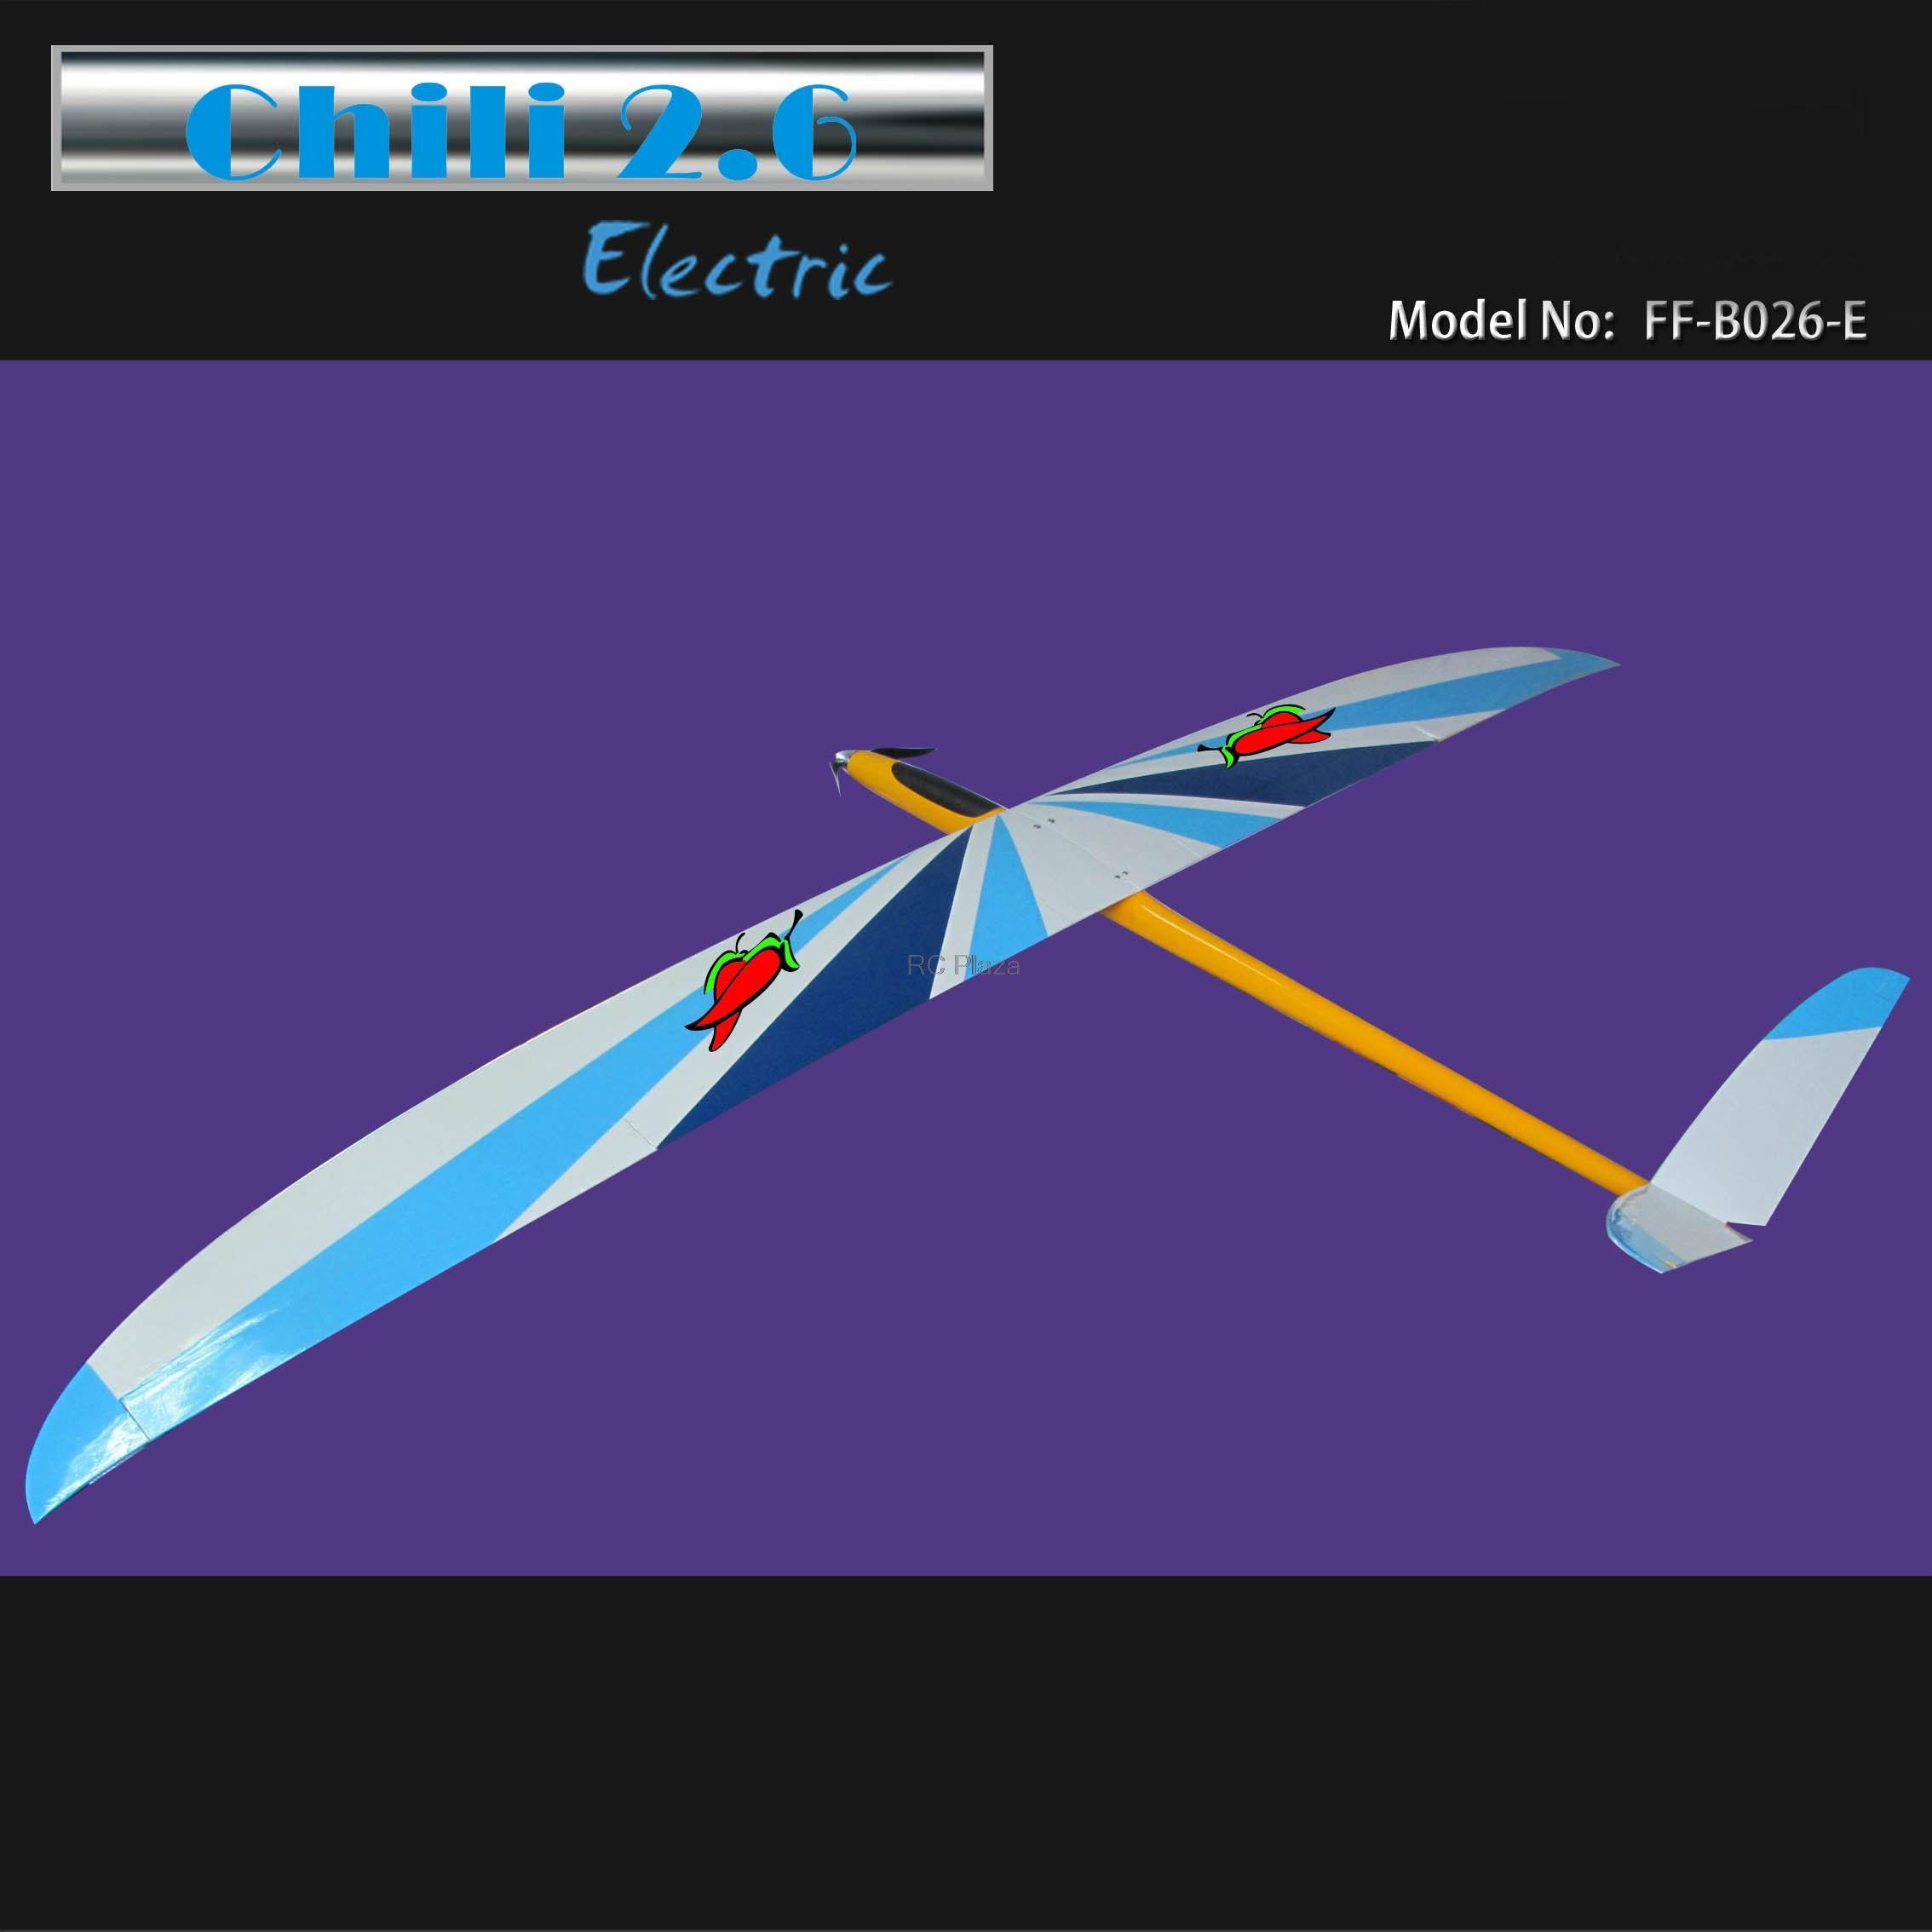 60c3764236c FlyFly Hobby Geronimo Electric Glider 2600mm ARF with Motor Propeller  Spinner Esc Servo RC Fiberglass Sailplane